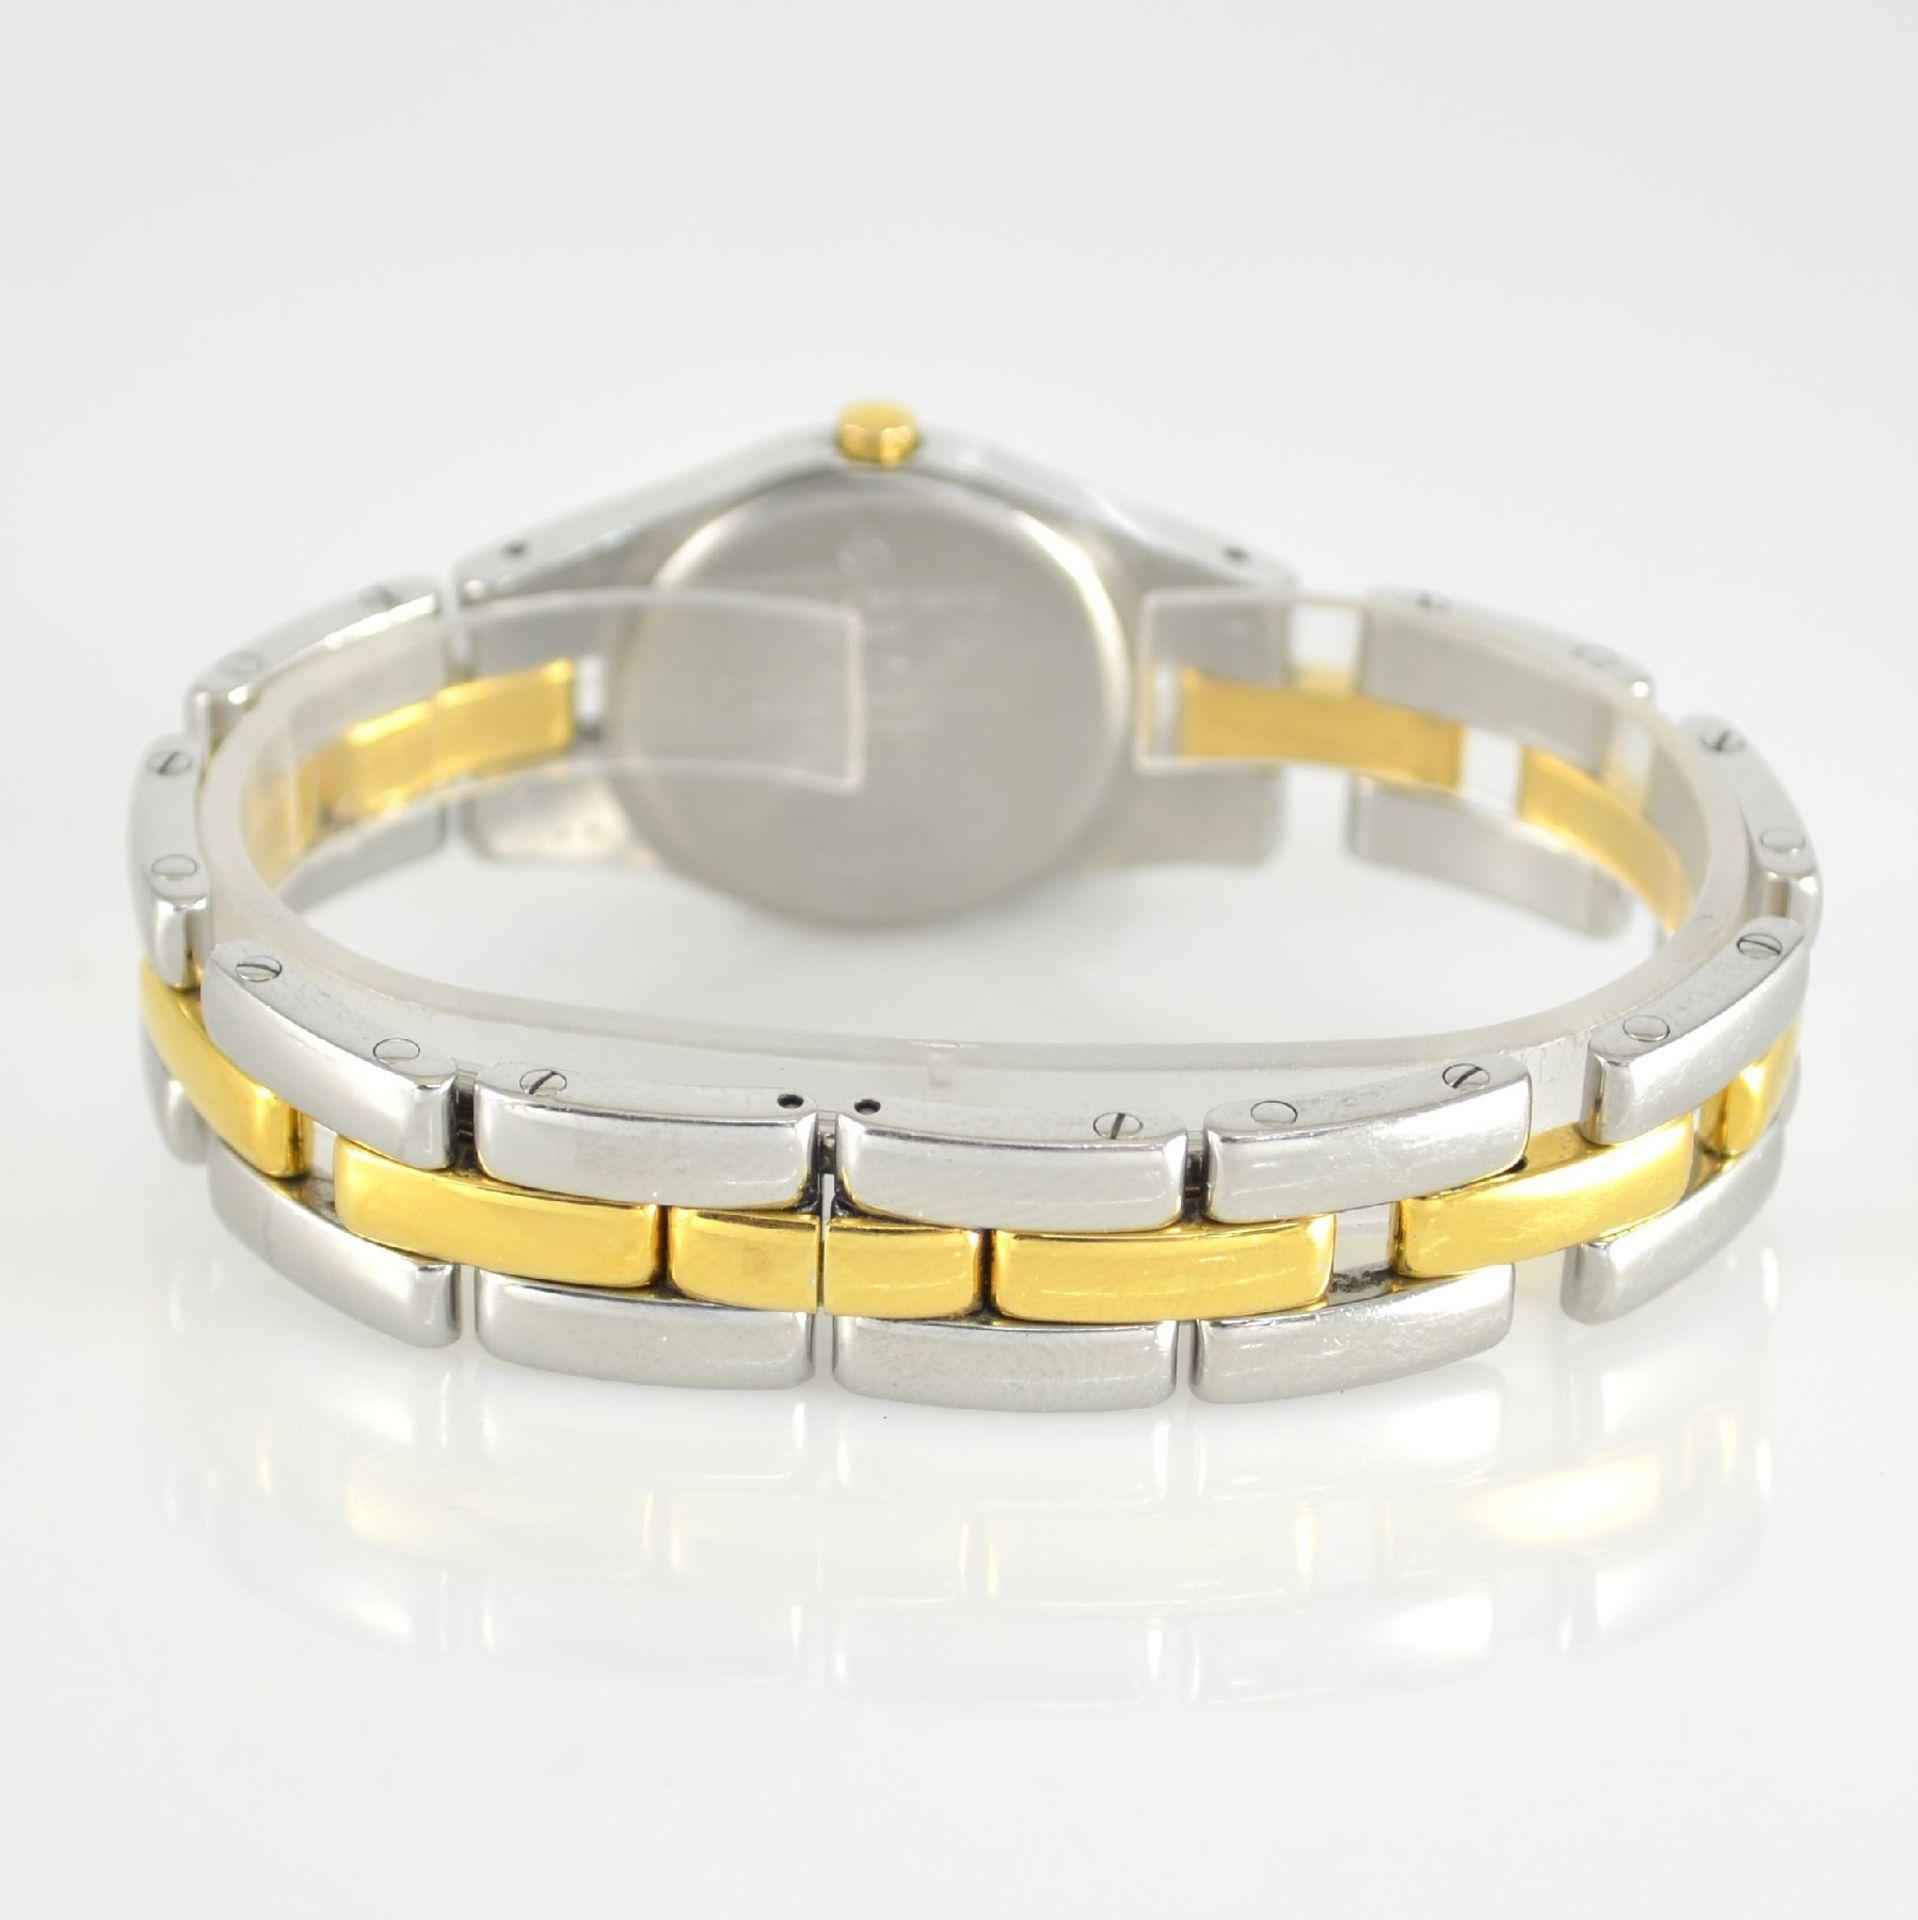 BAUME & MERCIER Damenarmbanduhr in Stahl/ vergoldet, Schweiz um 2000, gedr. Geh. m. integr. - Bild 5 aus 6